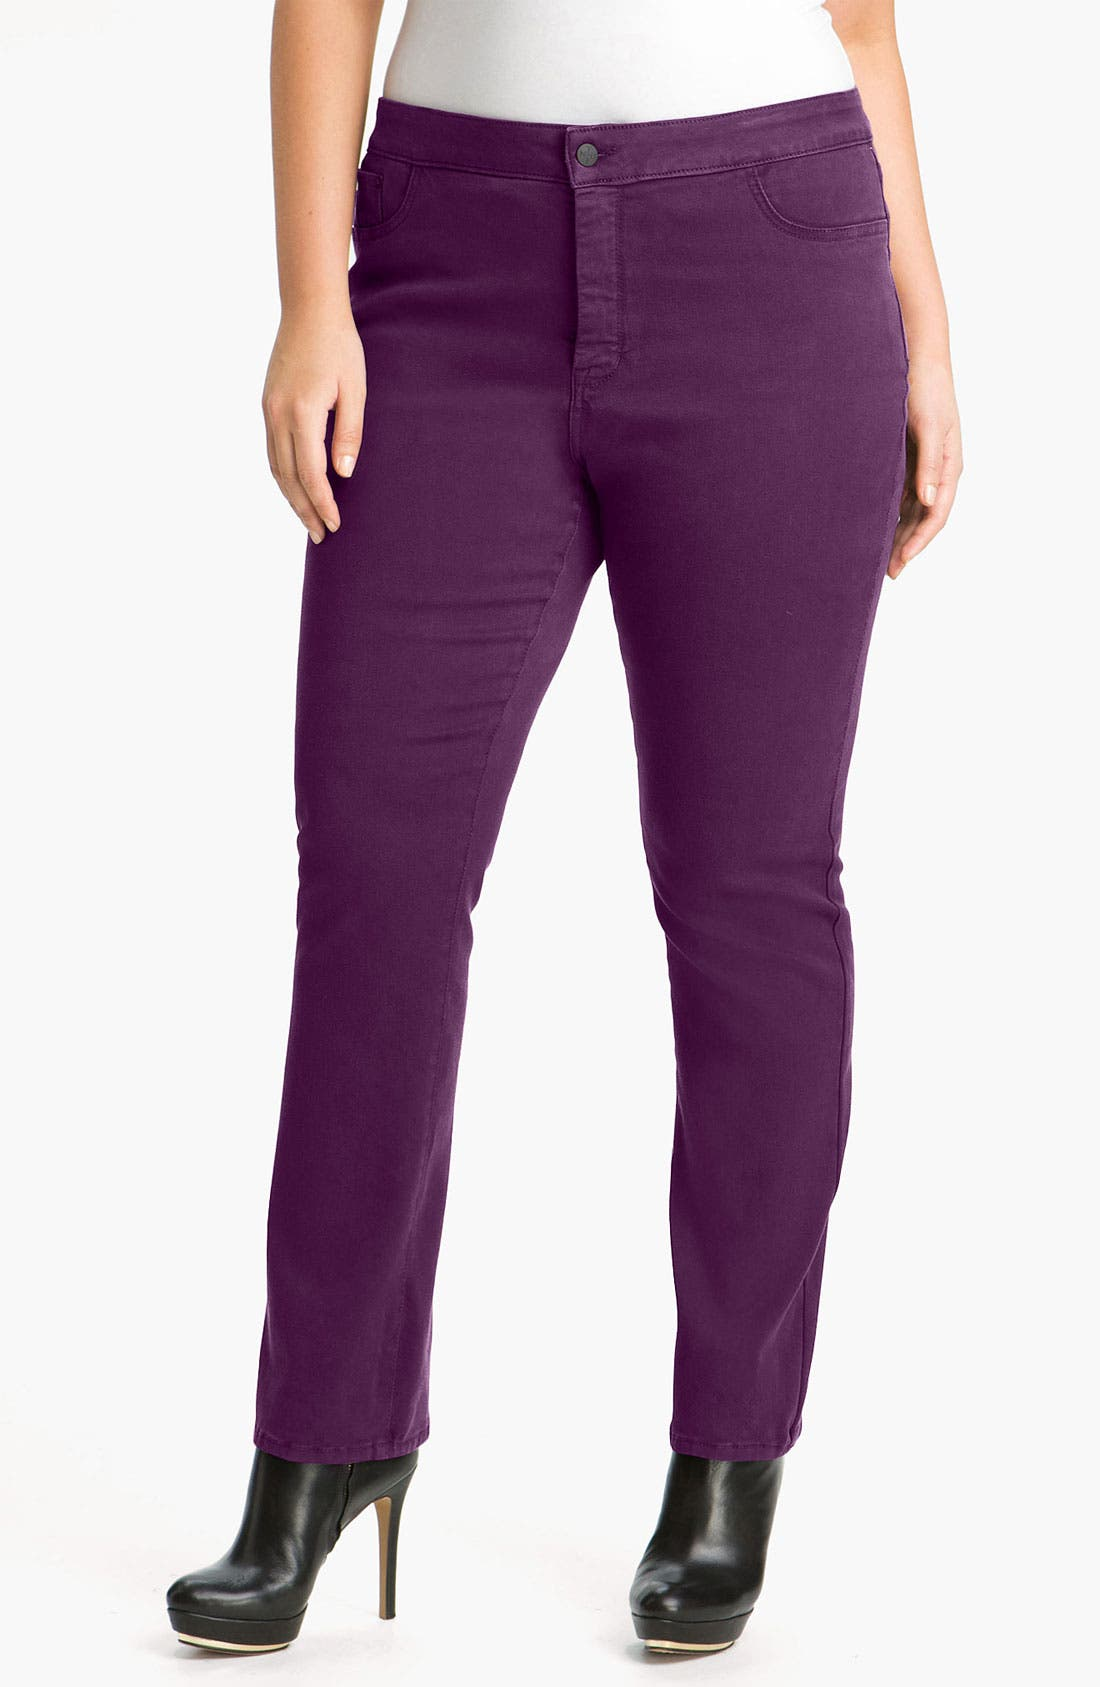 Main Image - NYDJ 'Jaclyn' Stretch Skinny Jeans (Plus)